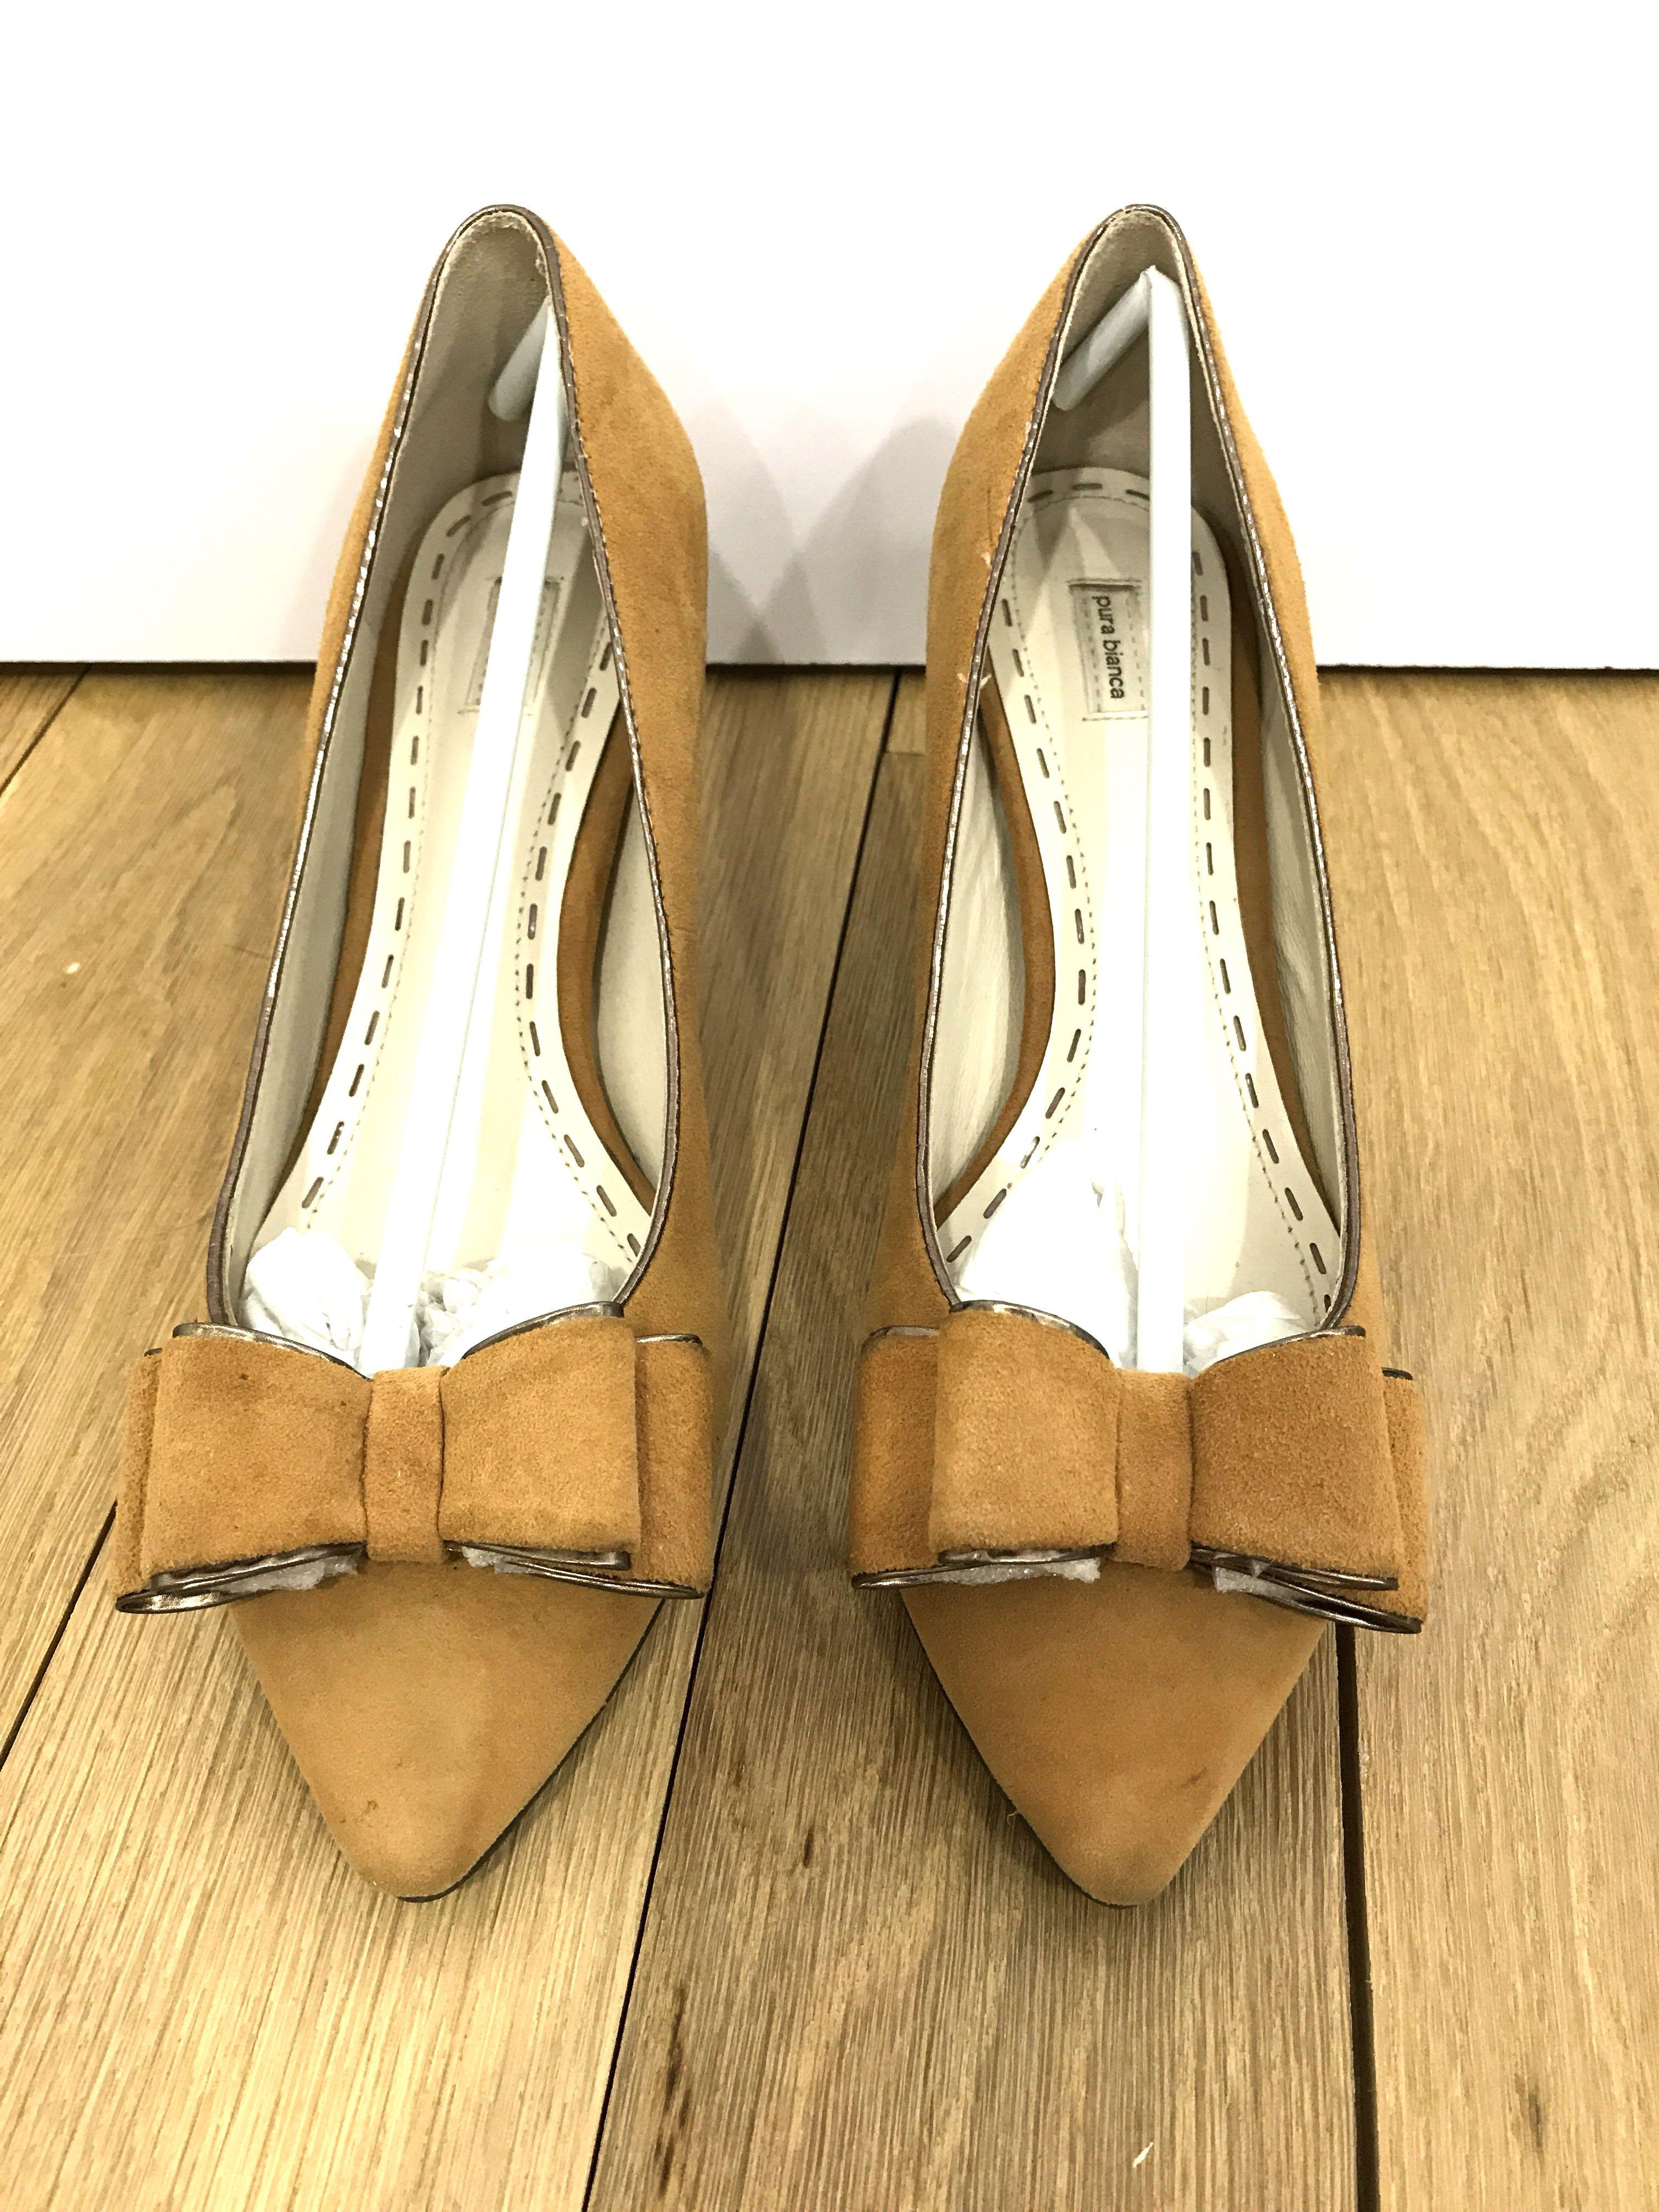 8a2f8f0bfab9 Home · Women s Fashion · Shoes · Heels. photo photo photo photo photo